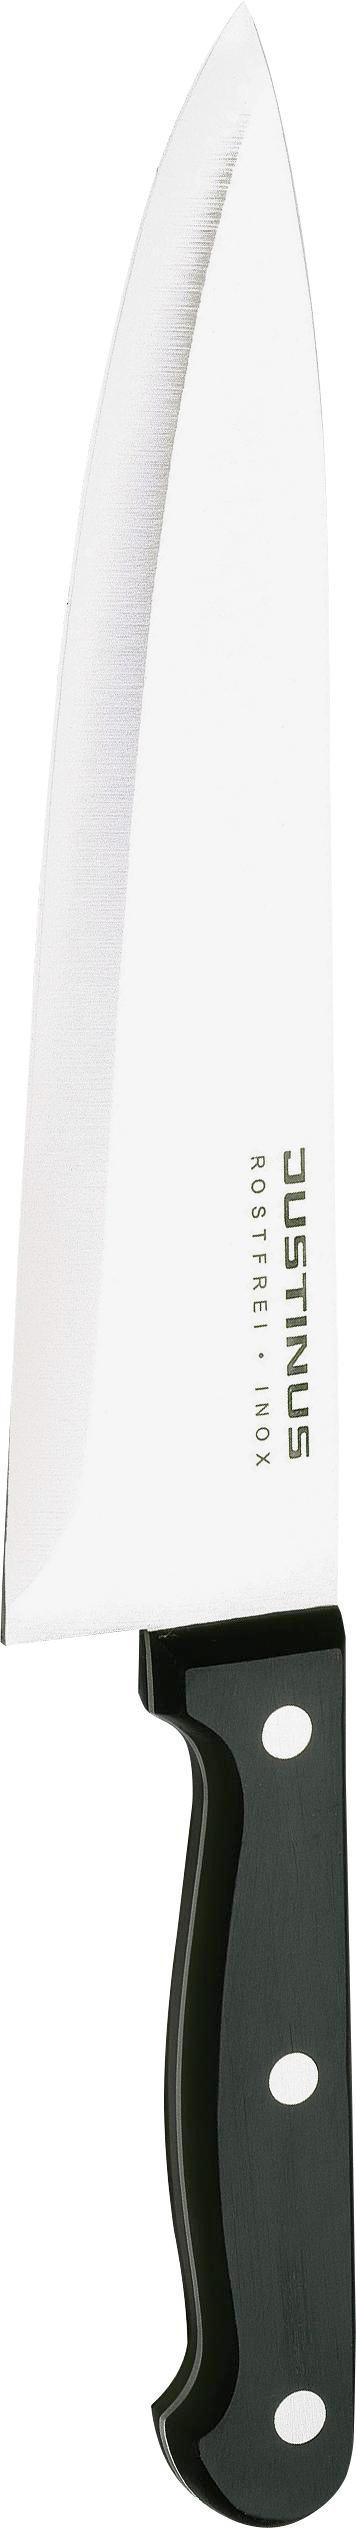 KUHINJSKI NOŽ - črna/srebrna, Konvencionalno, kovina/umetna masa (32cm) - JUSTINUS